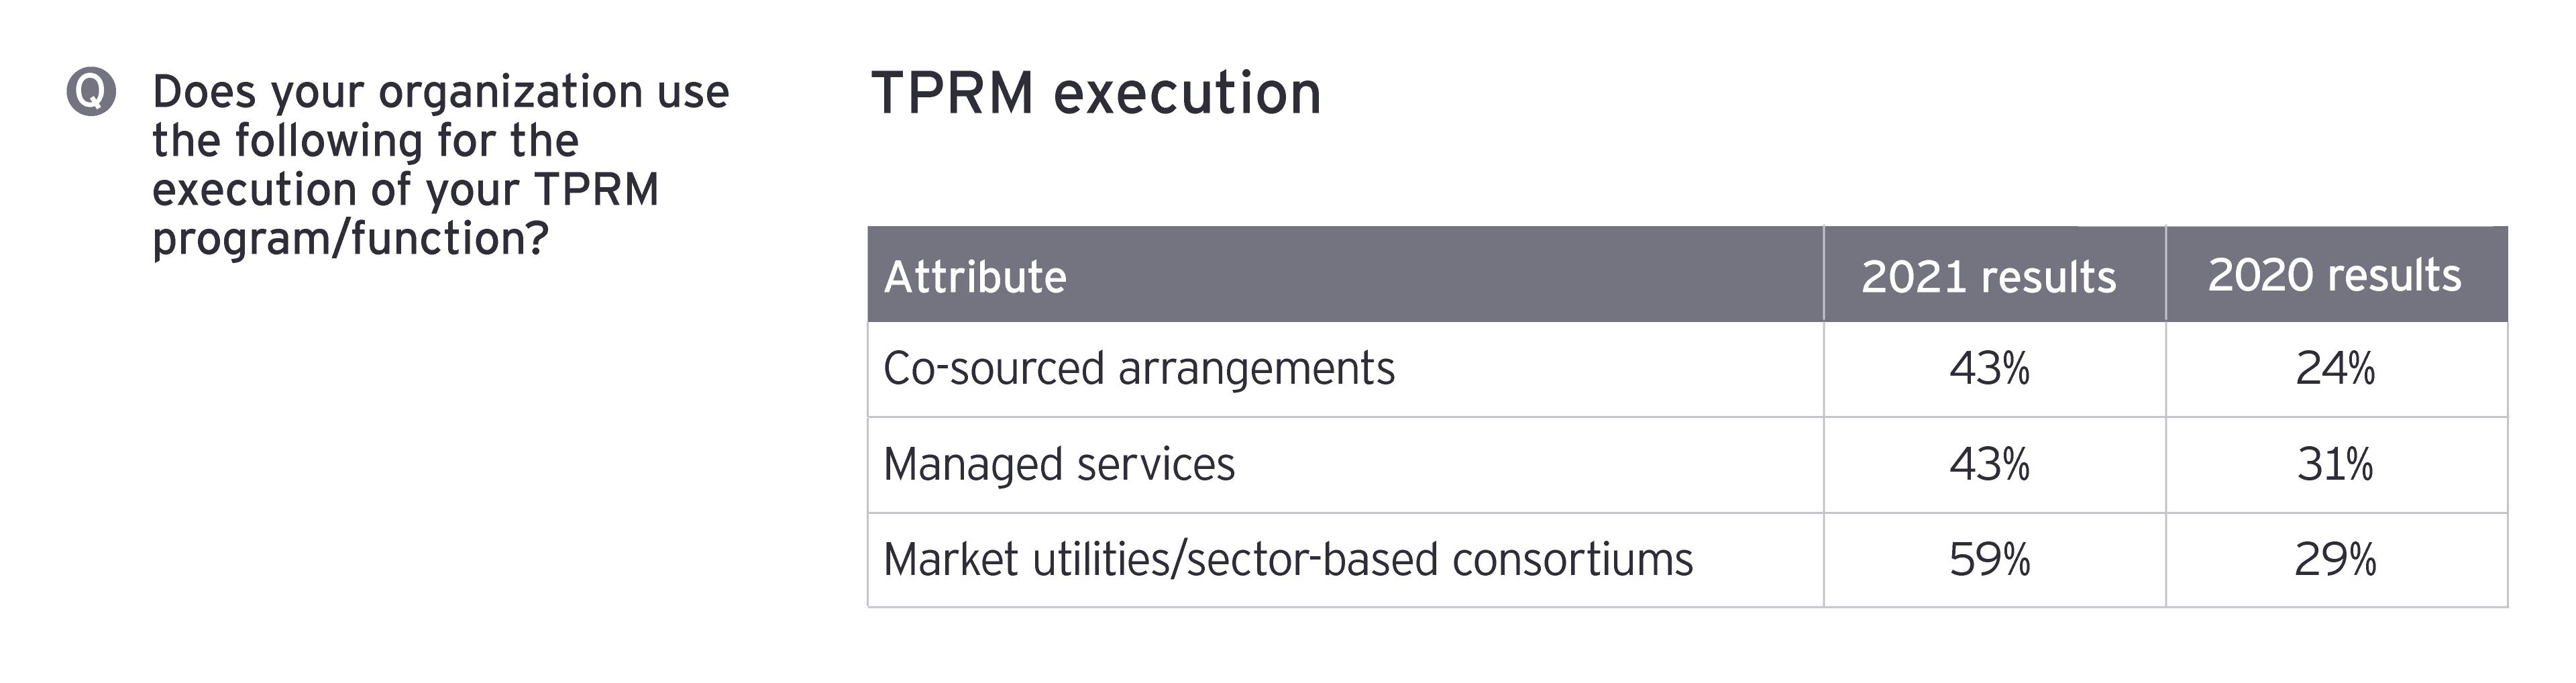 TPRM execution